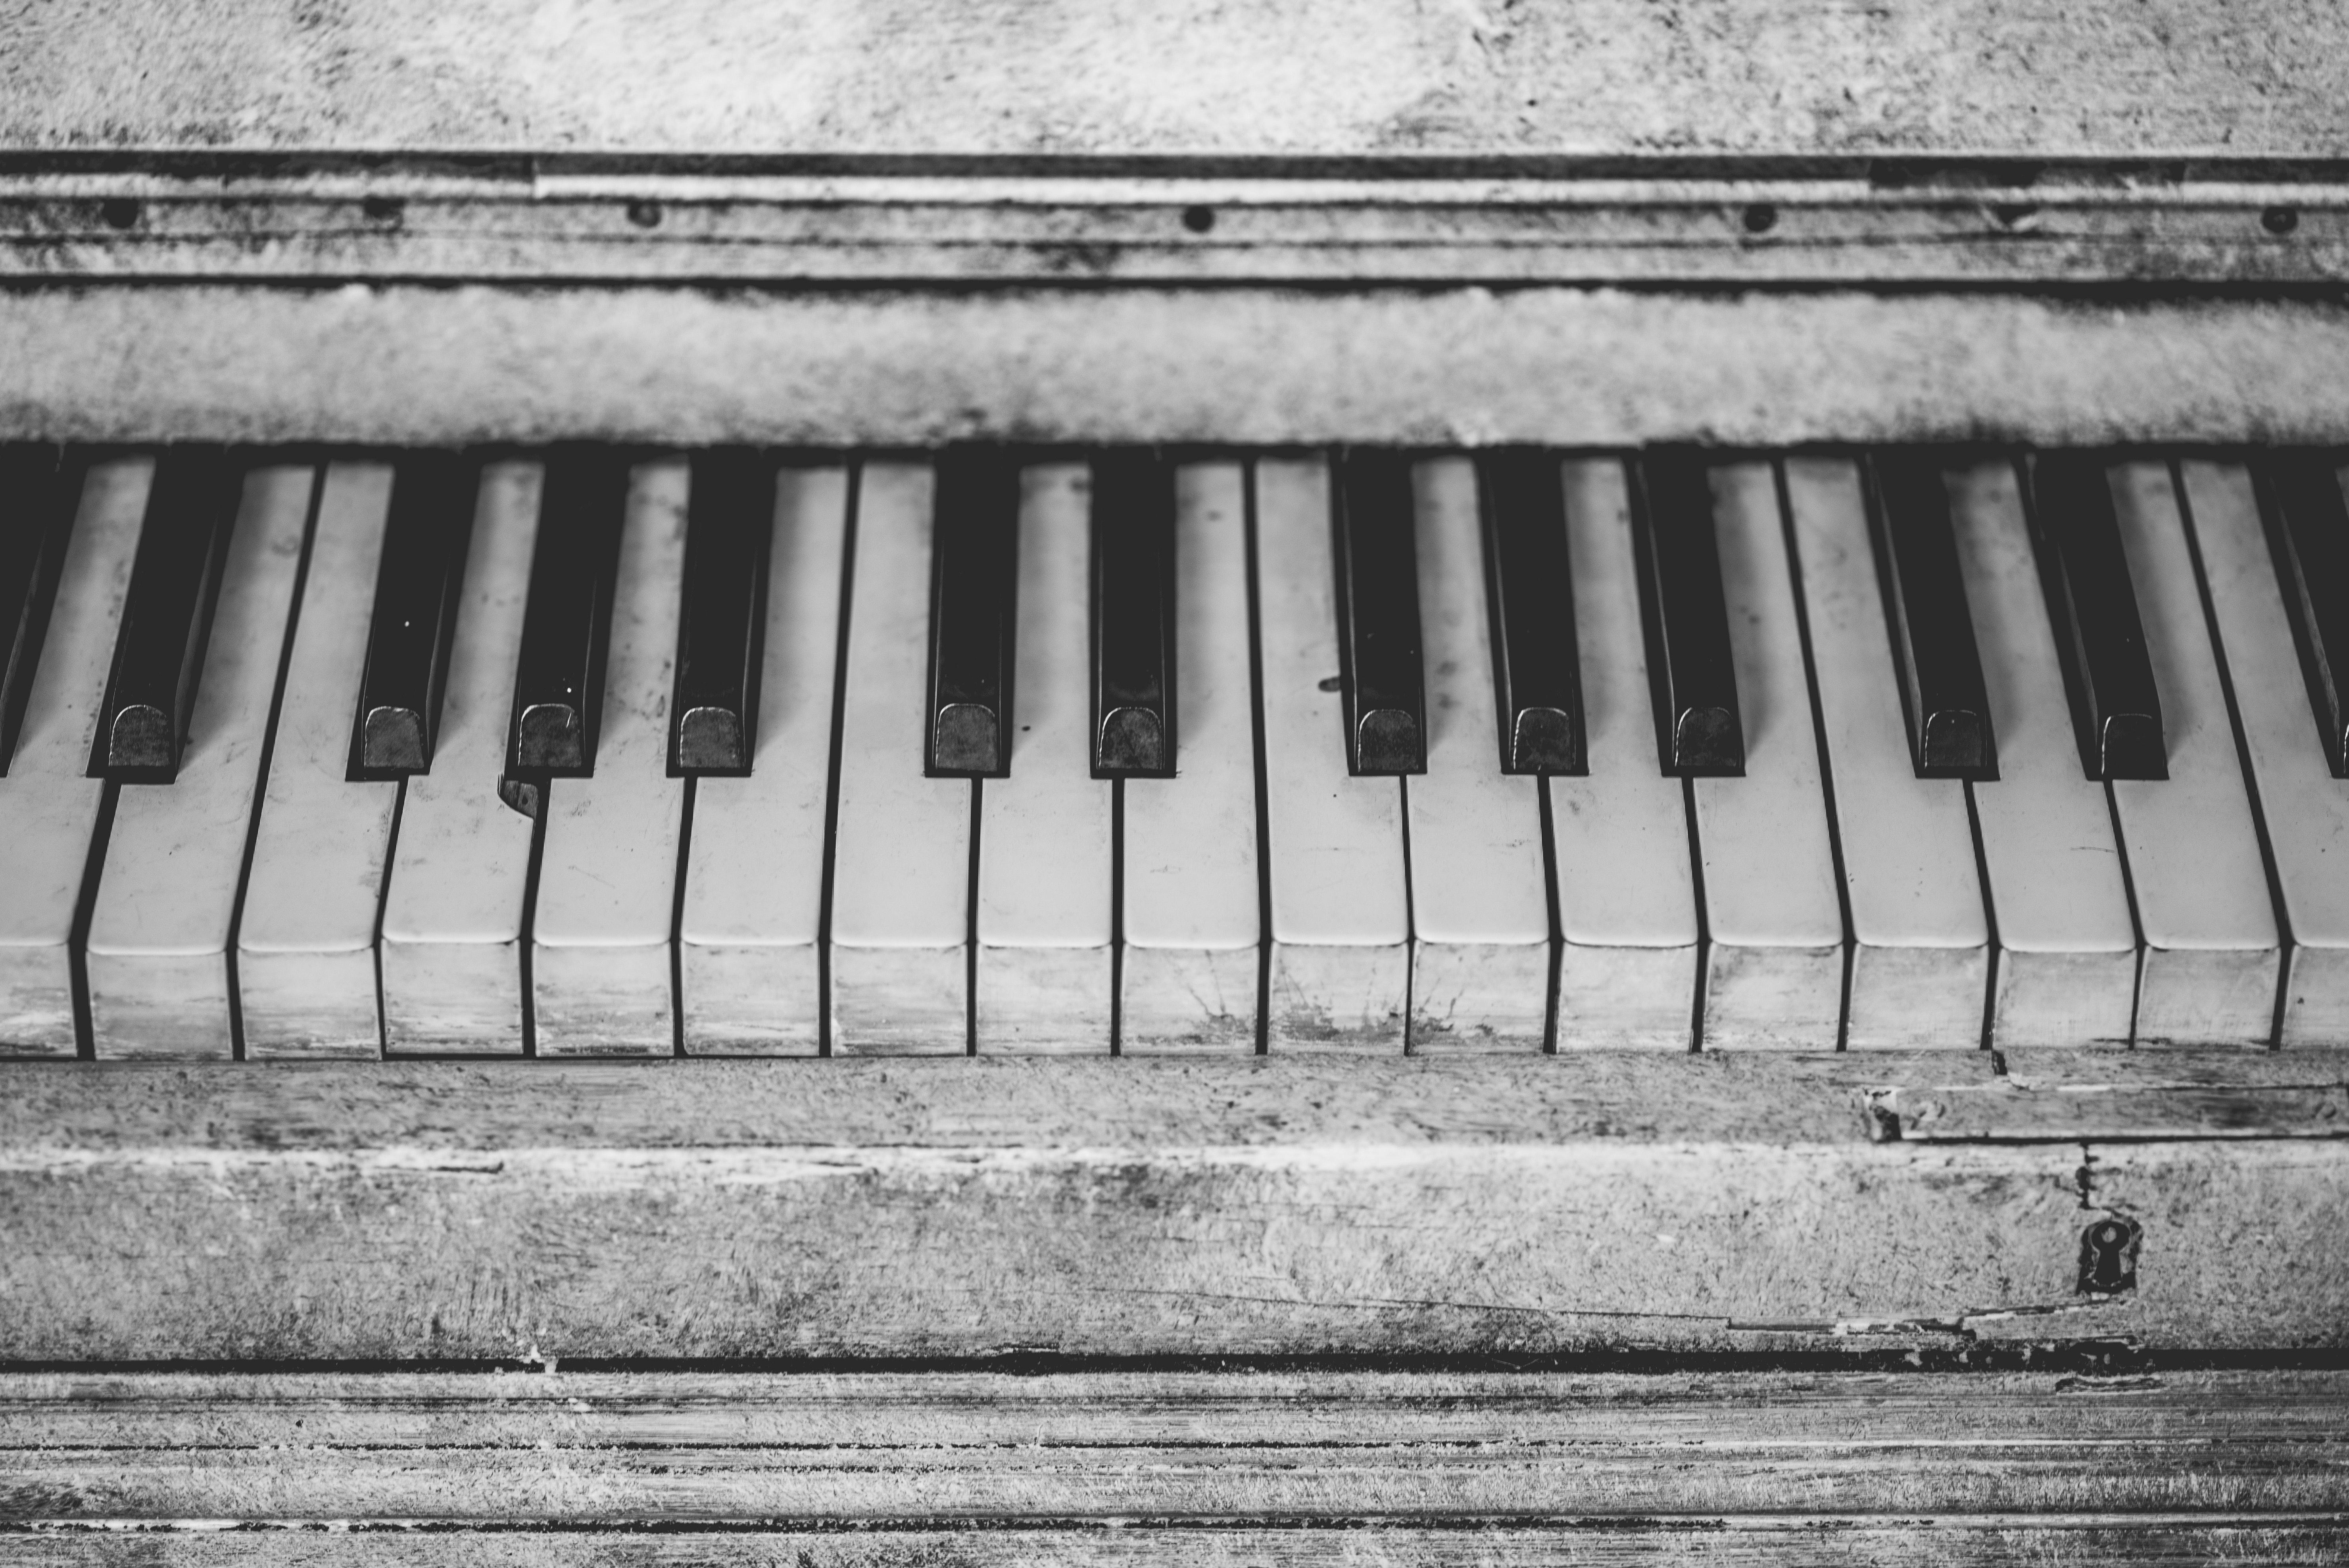 Similar photos close up photo of piano keys